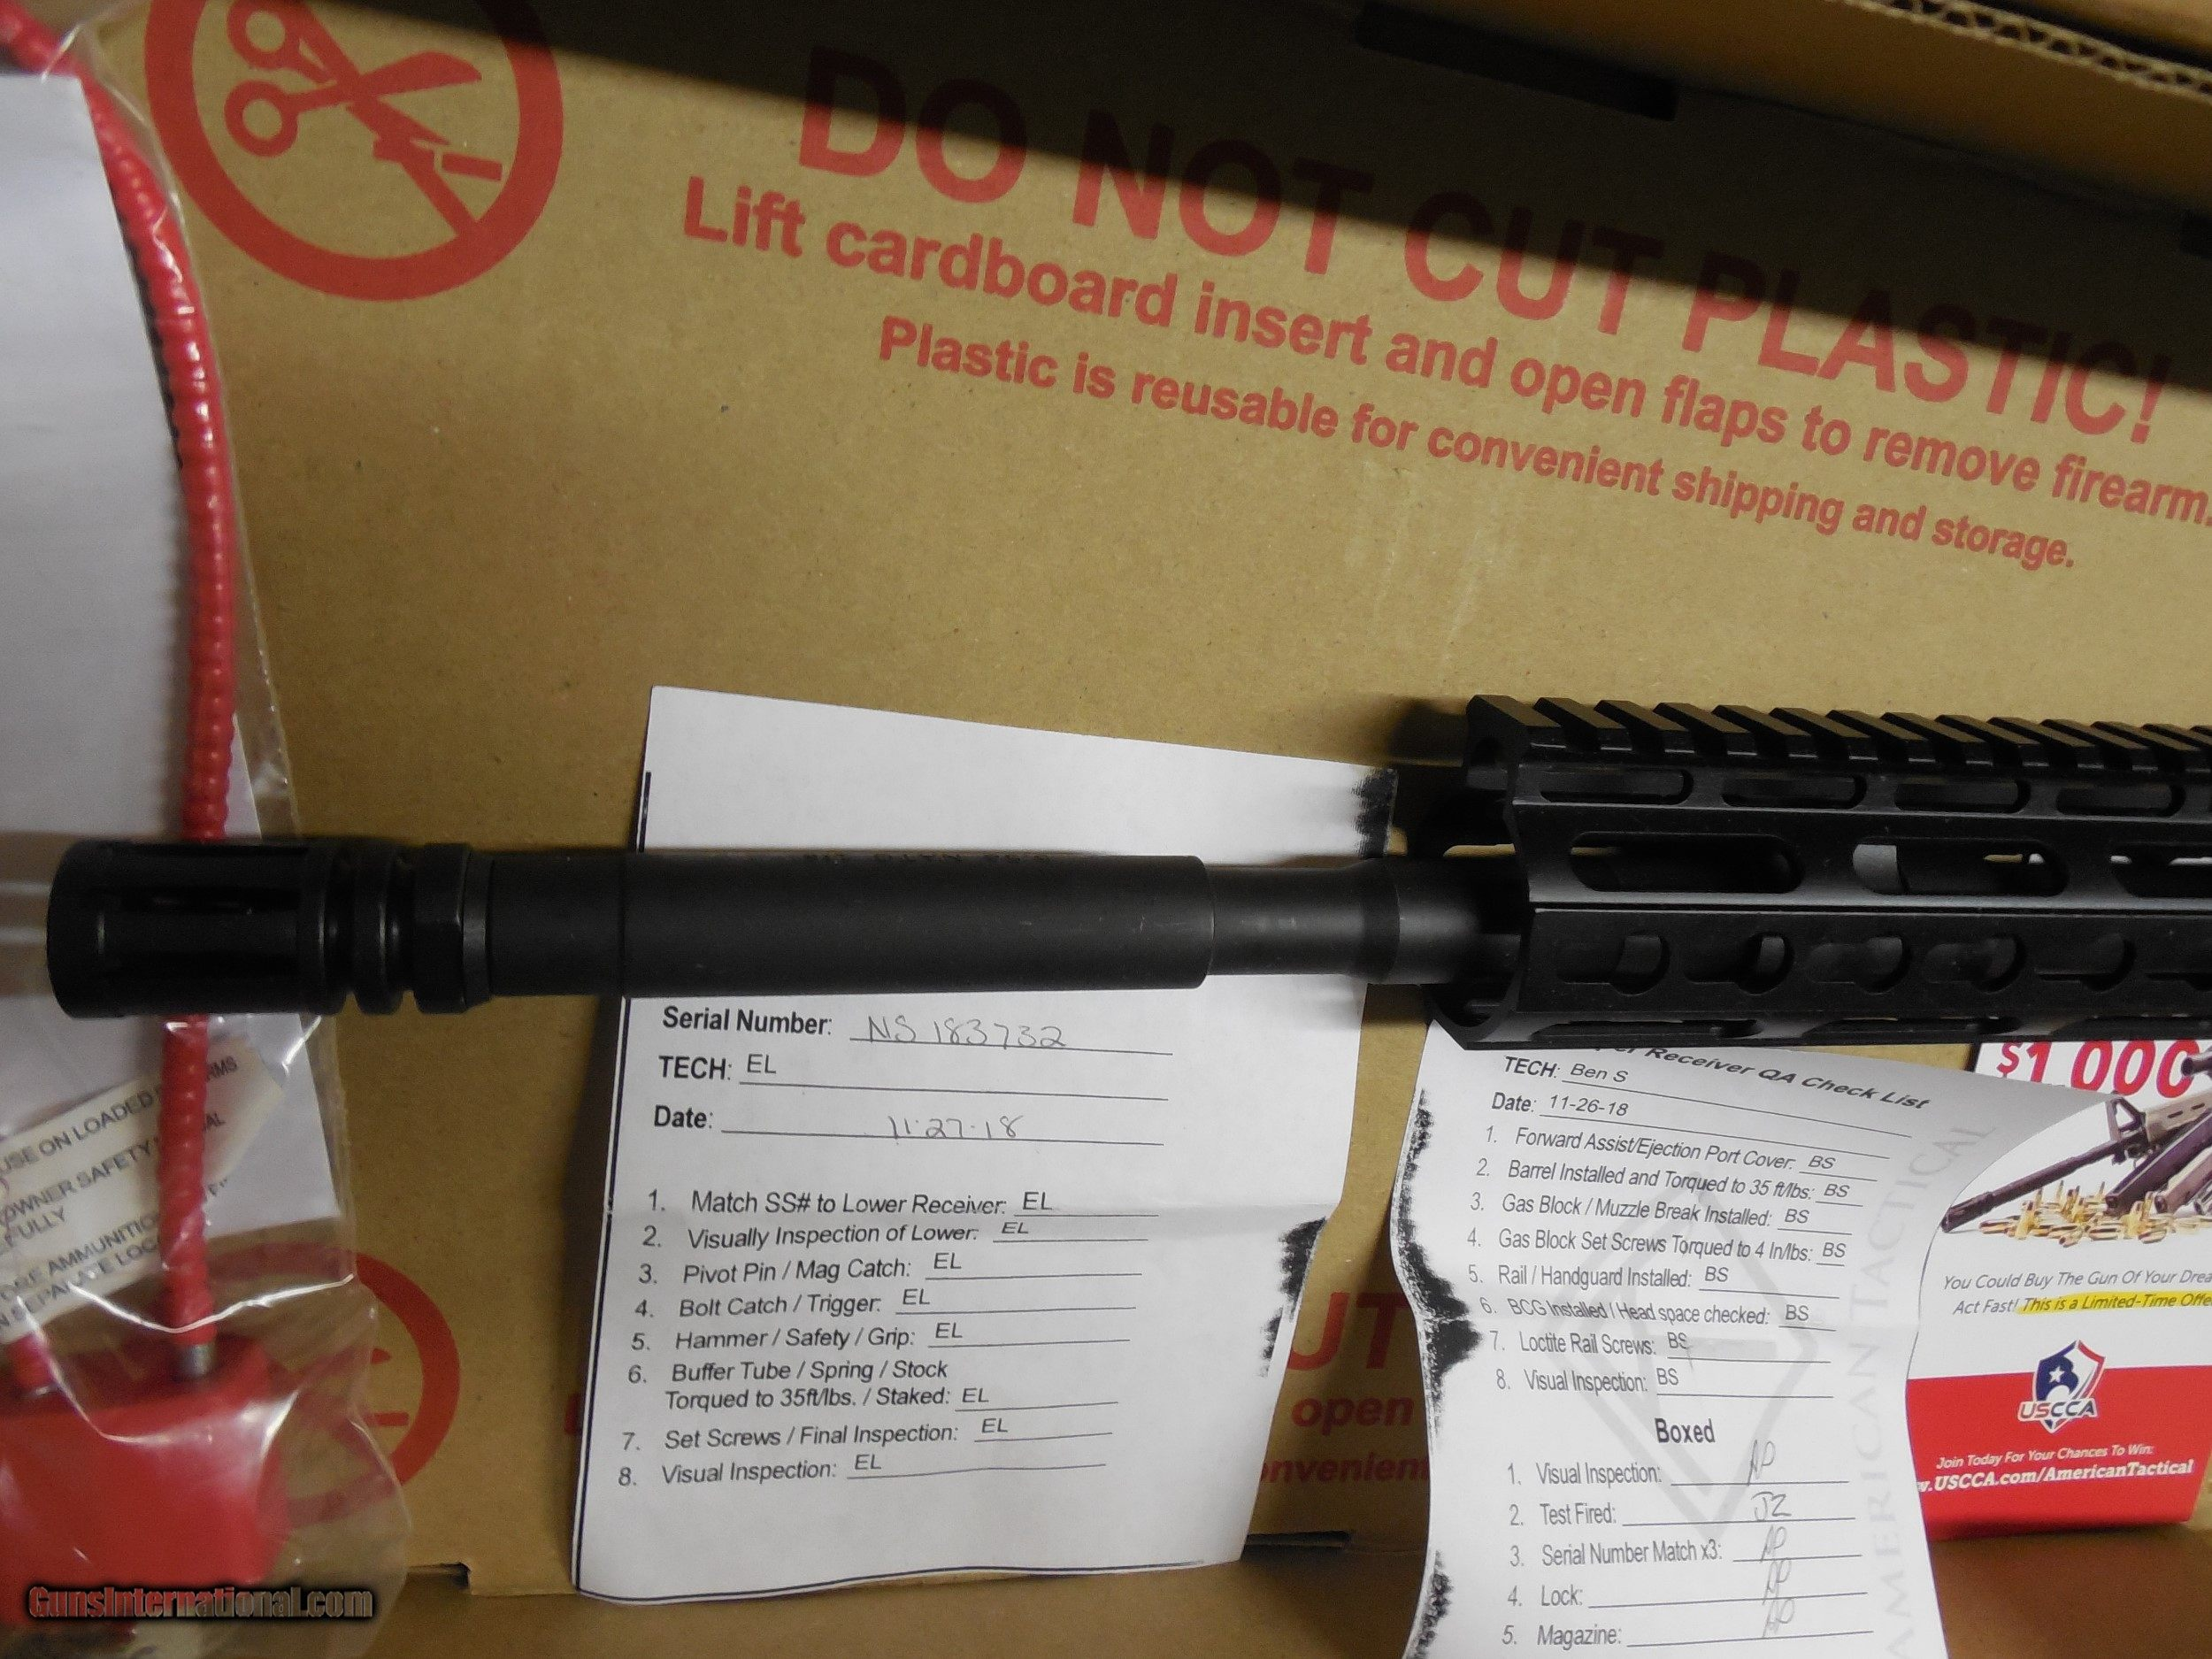 AR-15 A T I  OMNI MAXX P3P HYBRID, 5 56 NATO, 30 ROUND